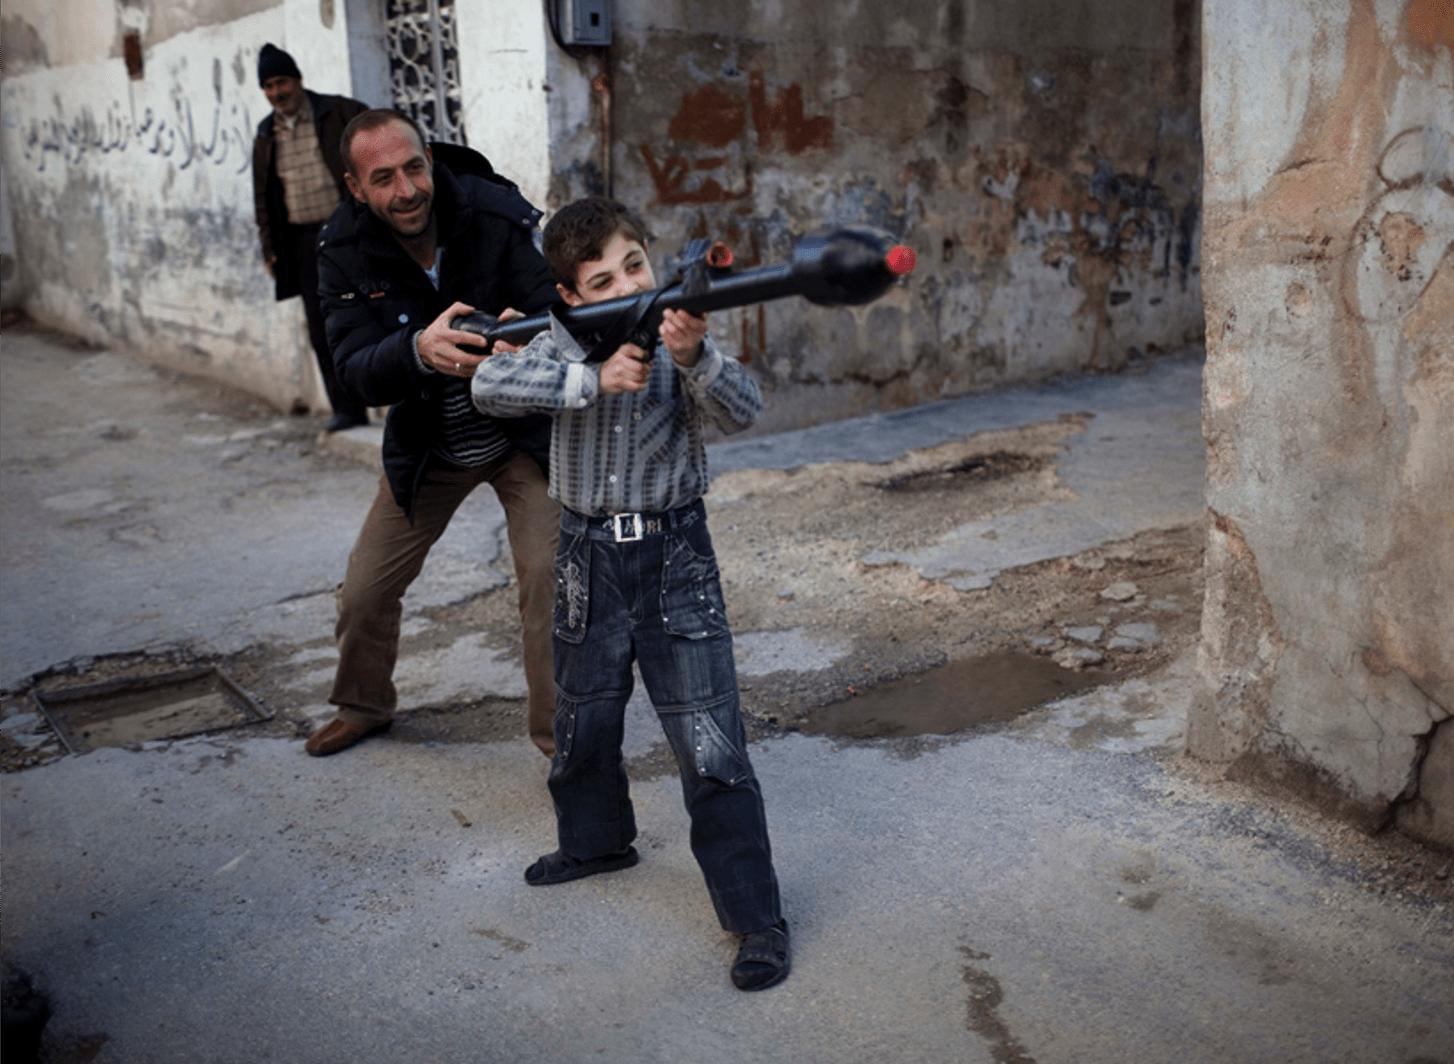 A man teaches Bilal, 11, how to use a toy rocket propelled grenade in Idlib, northern Syria, March 4, 2012. (Rodrigo Abd, Associated Press - March 4, 2012)